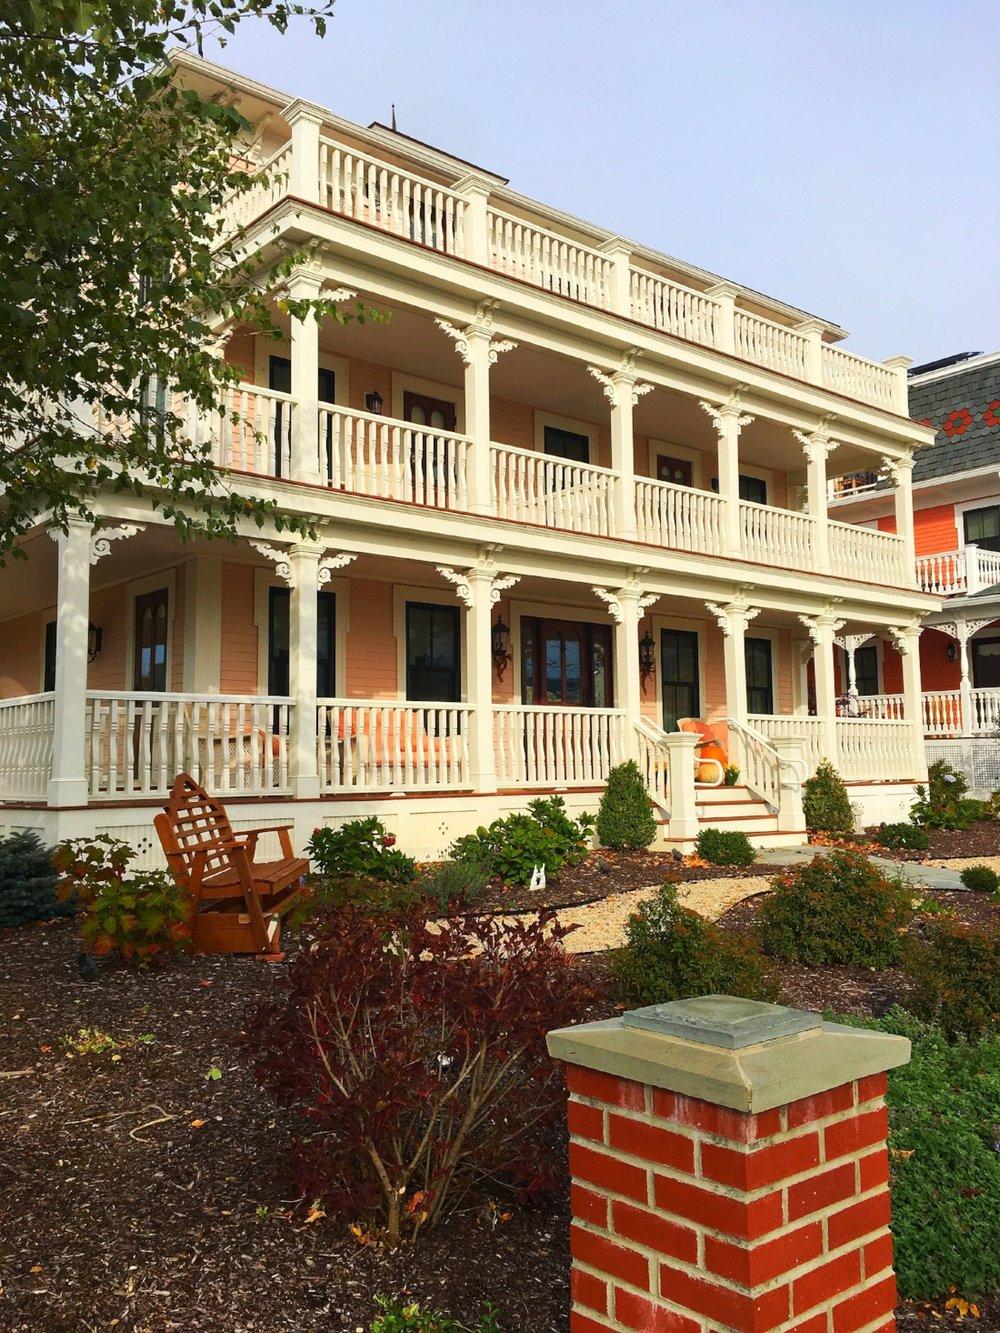 Three Stories Saybrook Point Inn